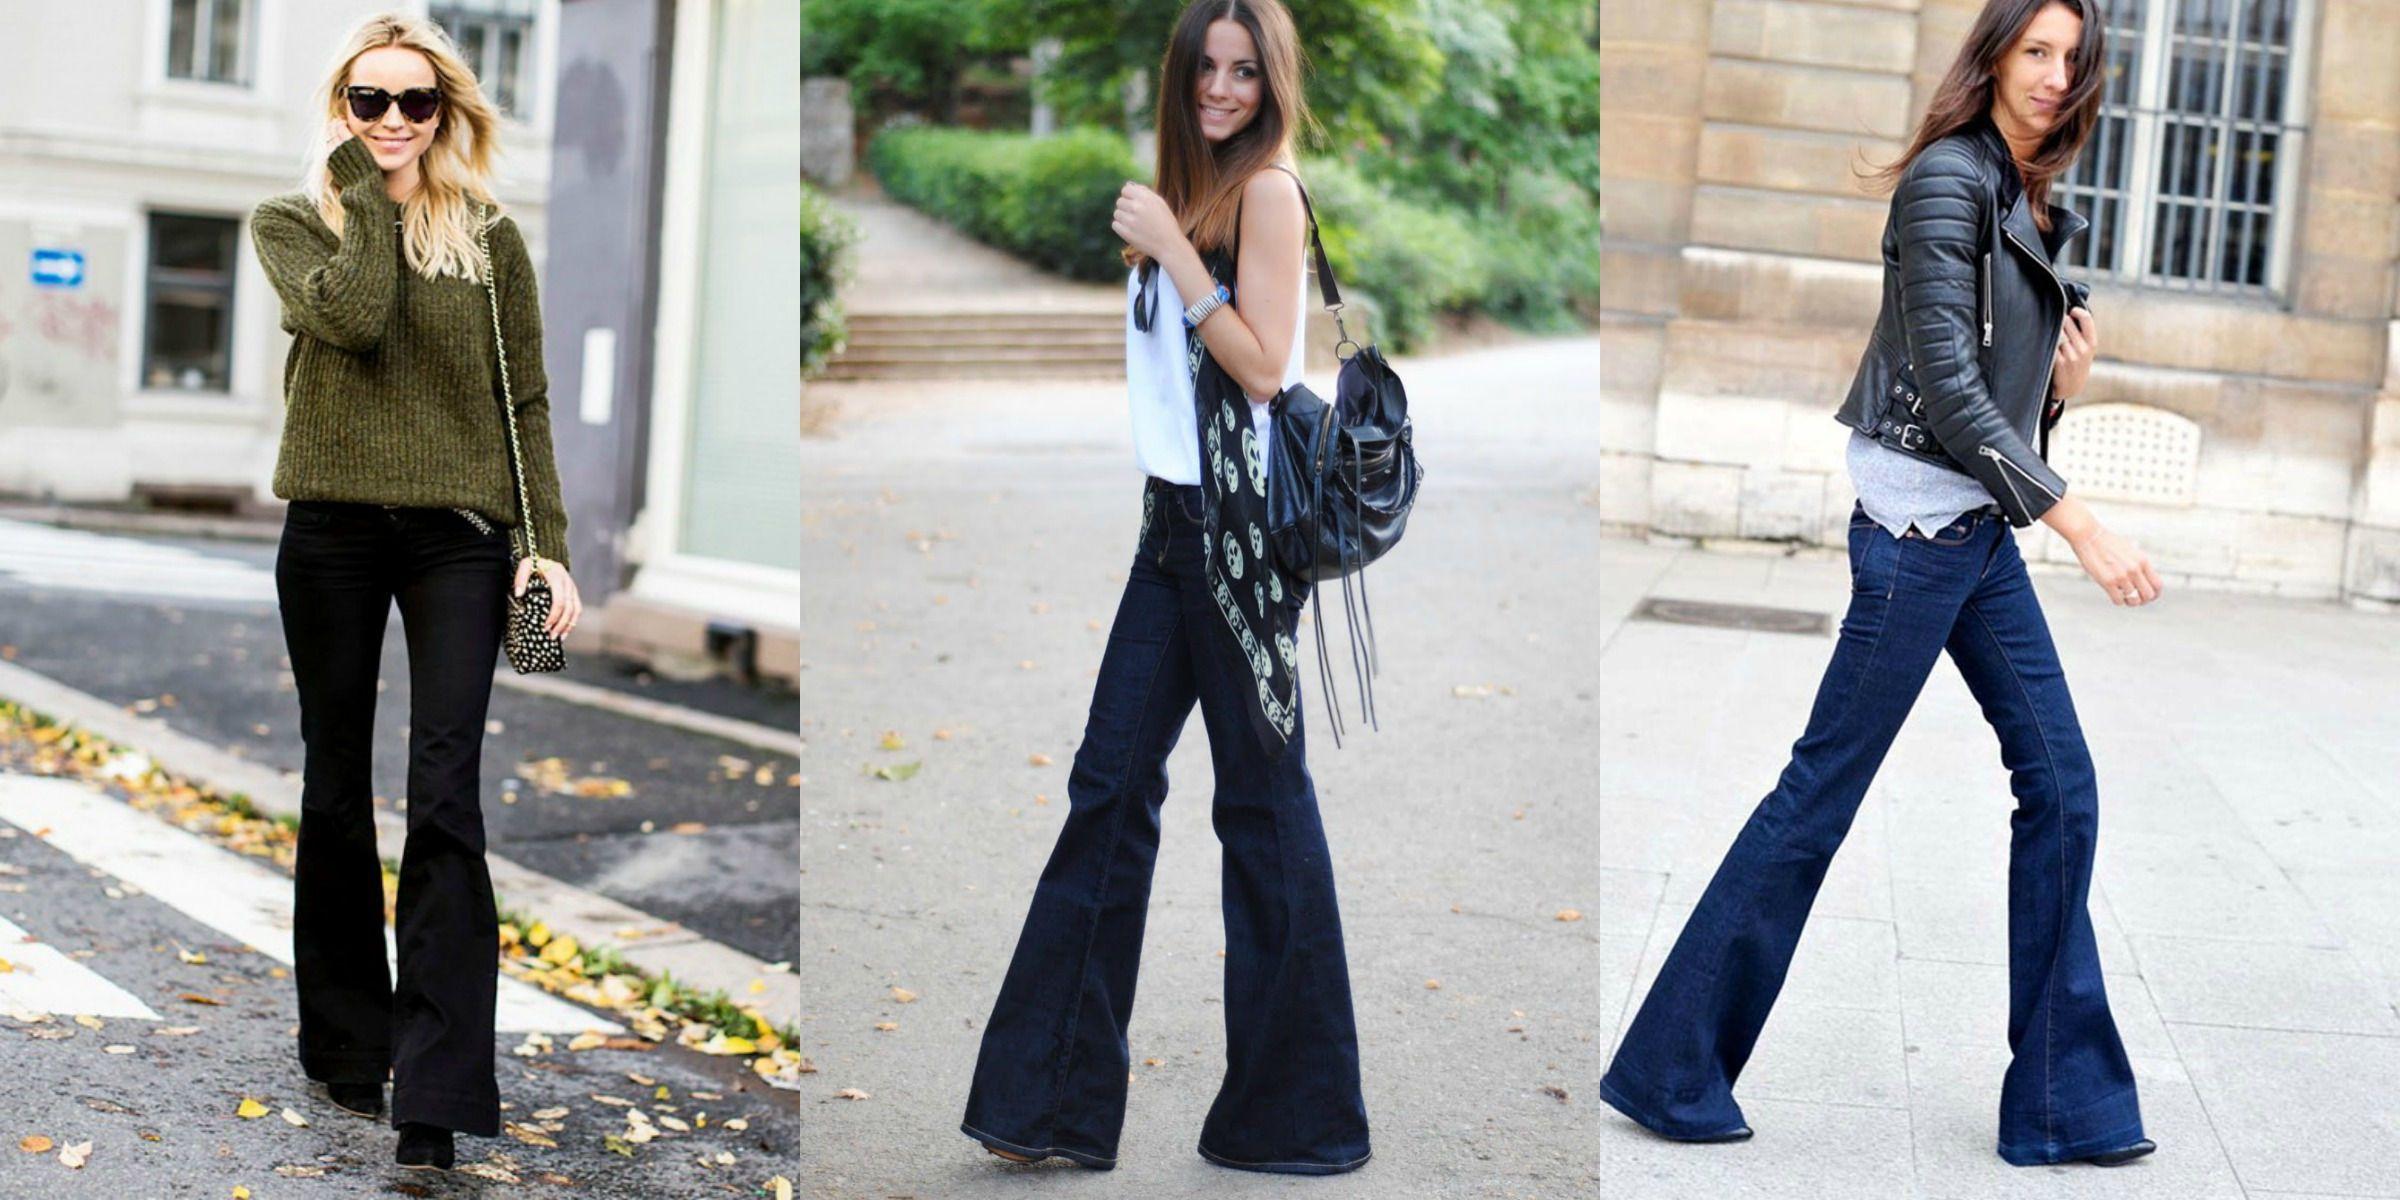 Torna di moda il jeans a zampa di elefante (video)